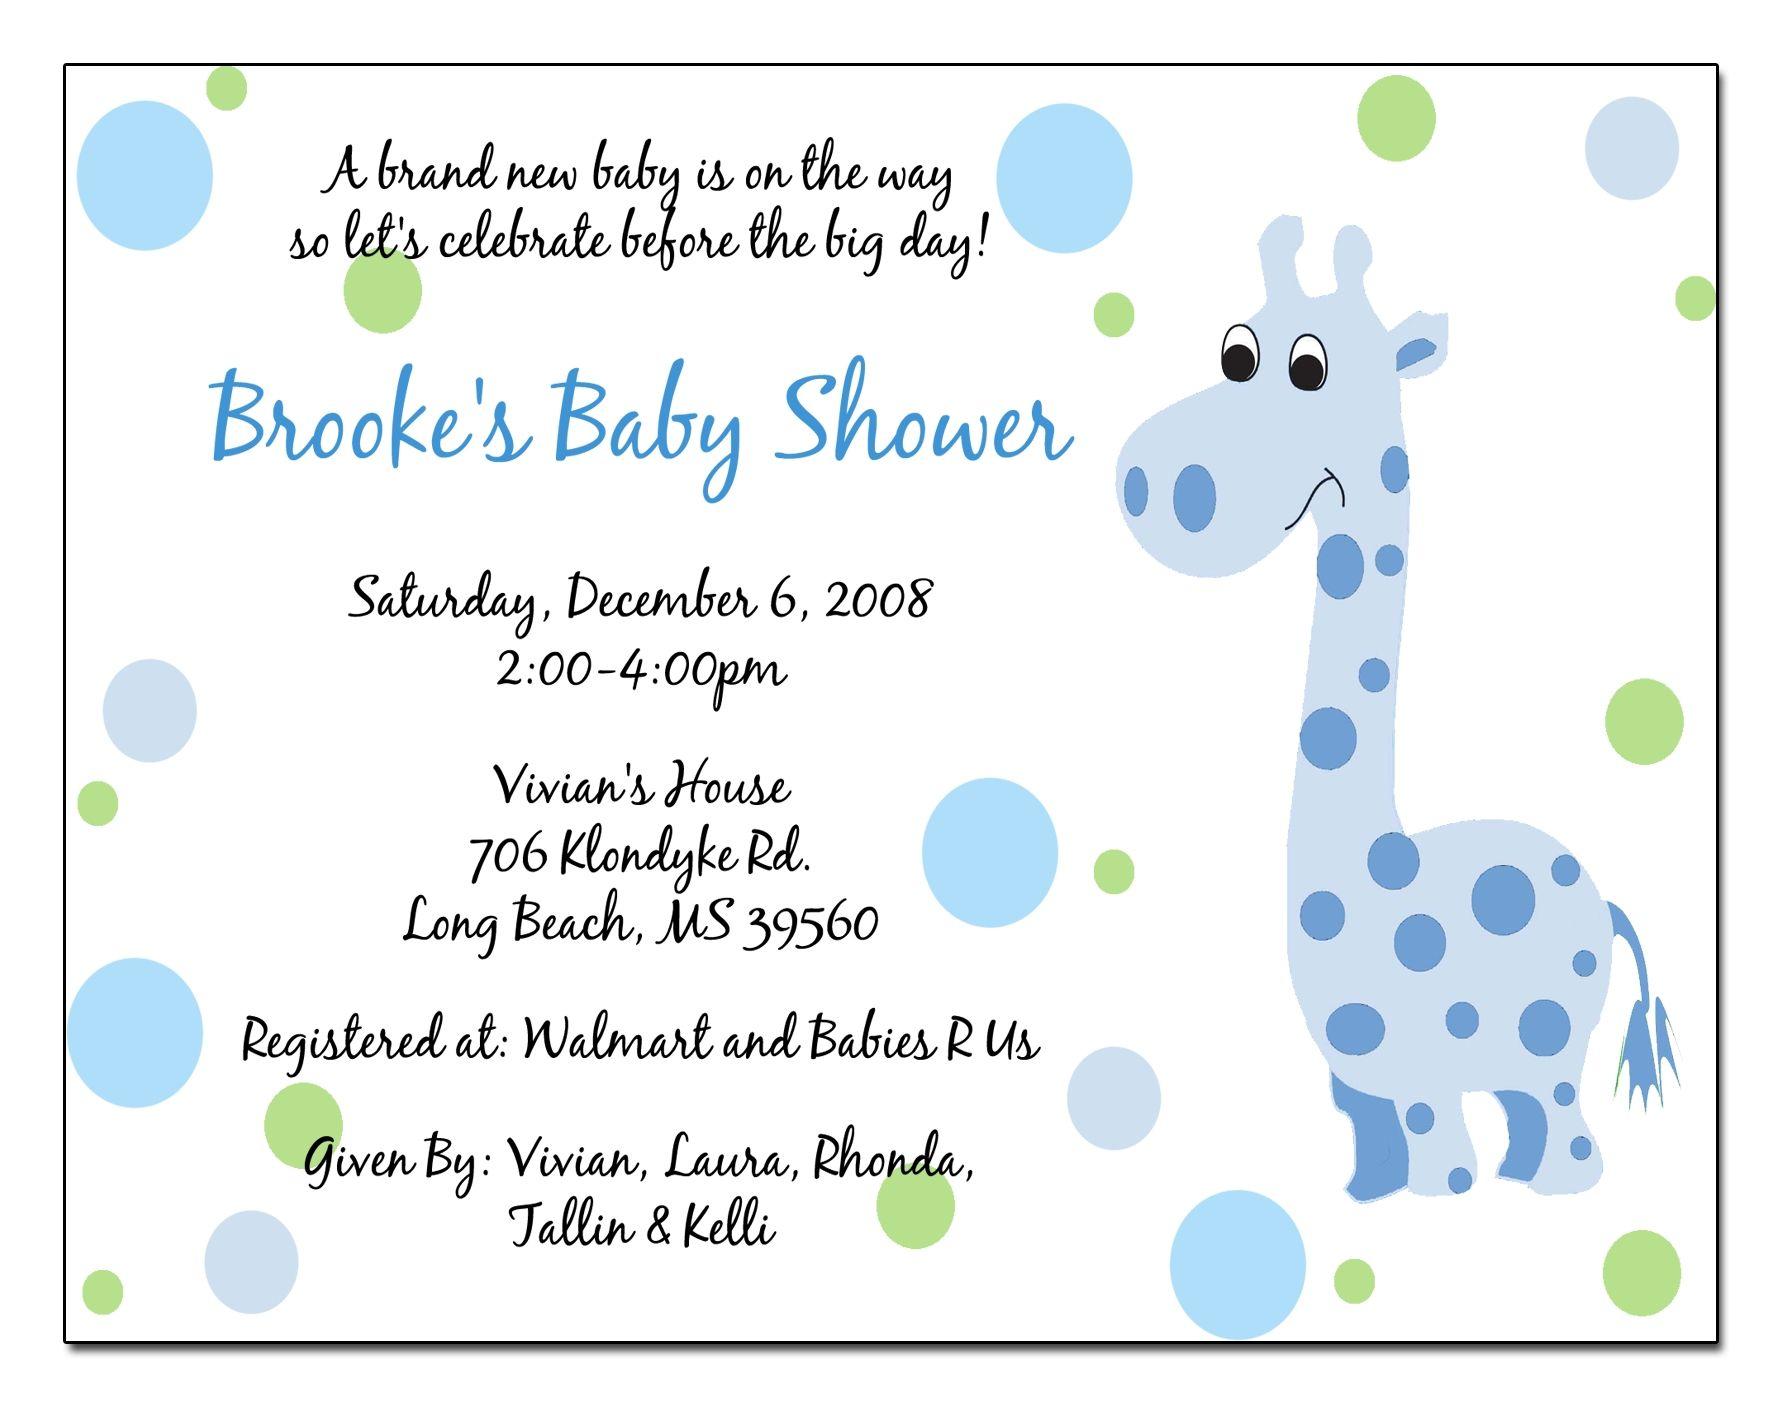 Sample Baby Boy Shower Invitation Wording | http://atwebry.info ...